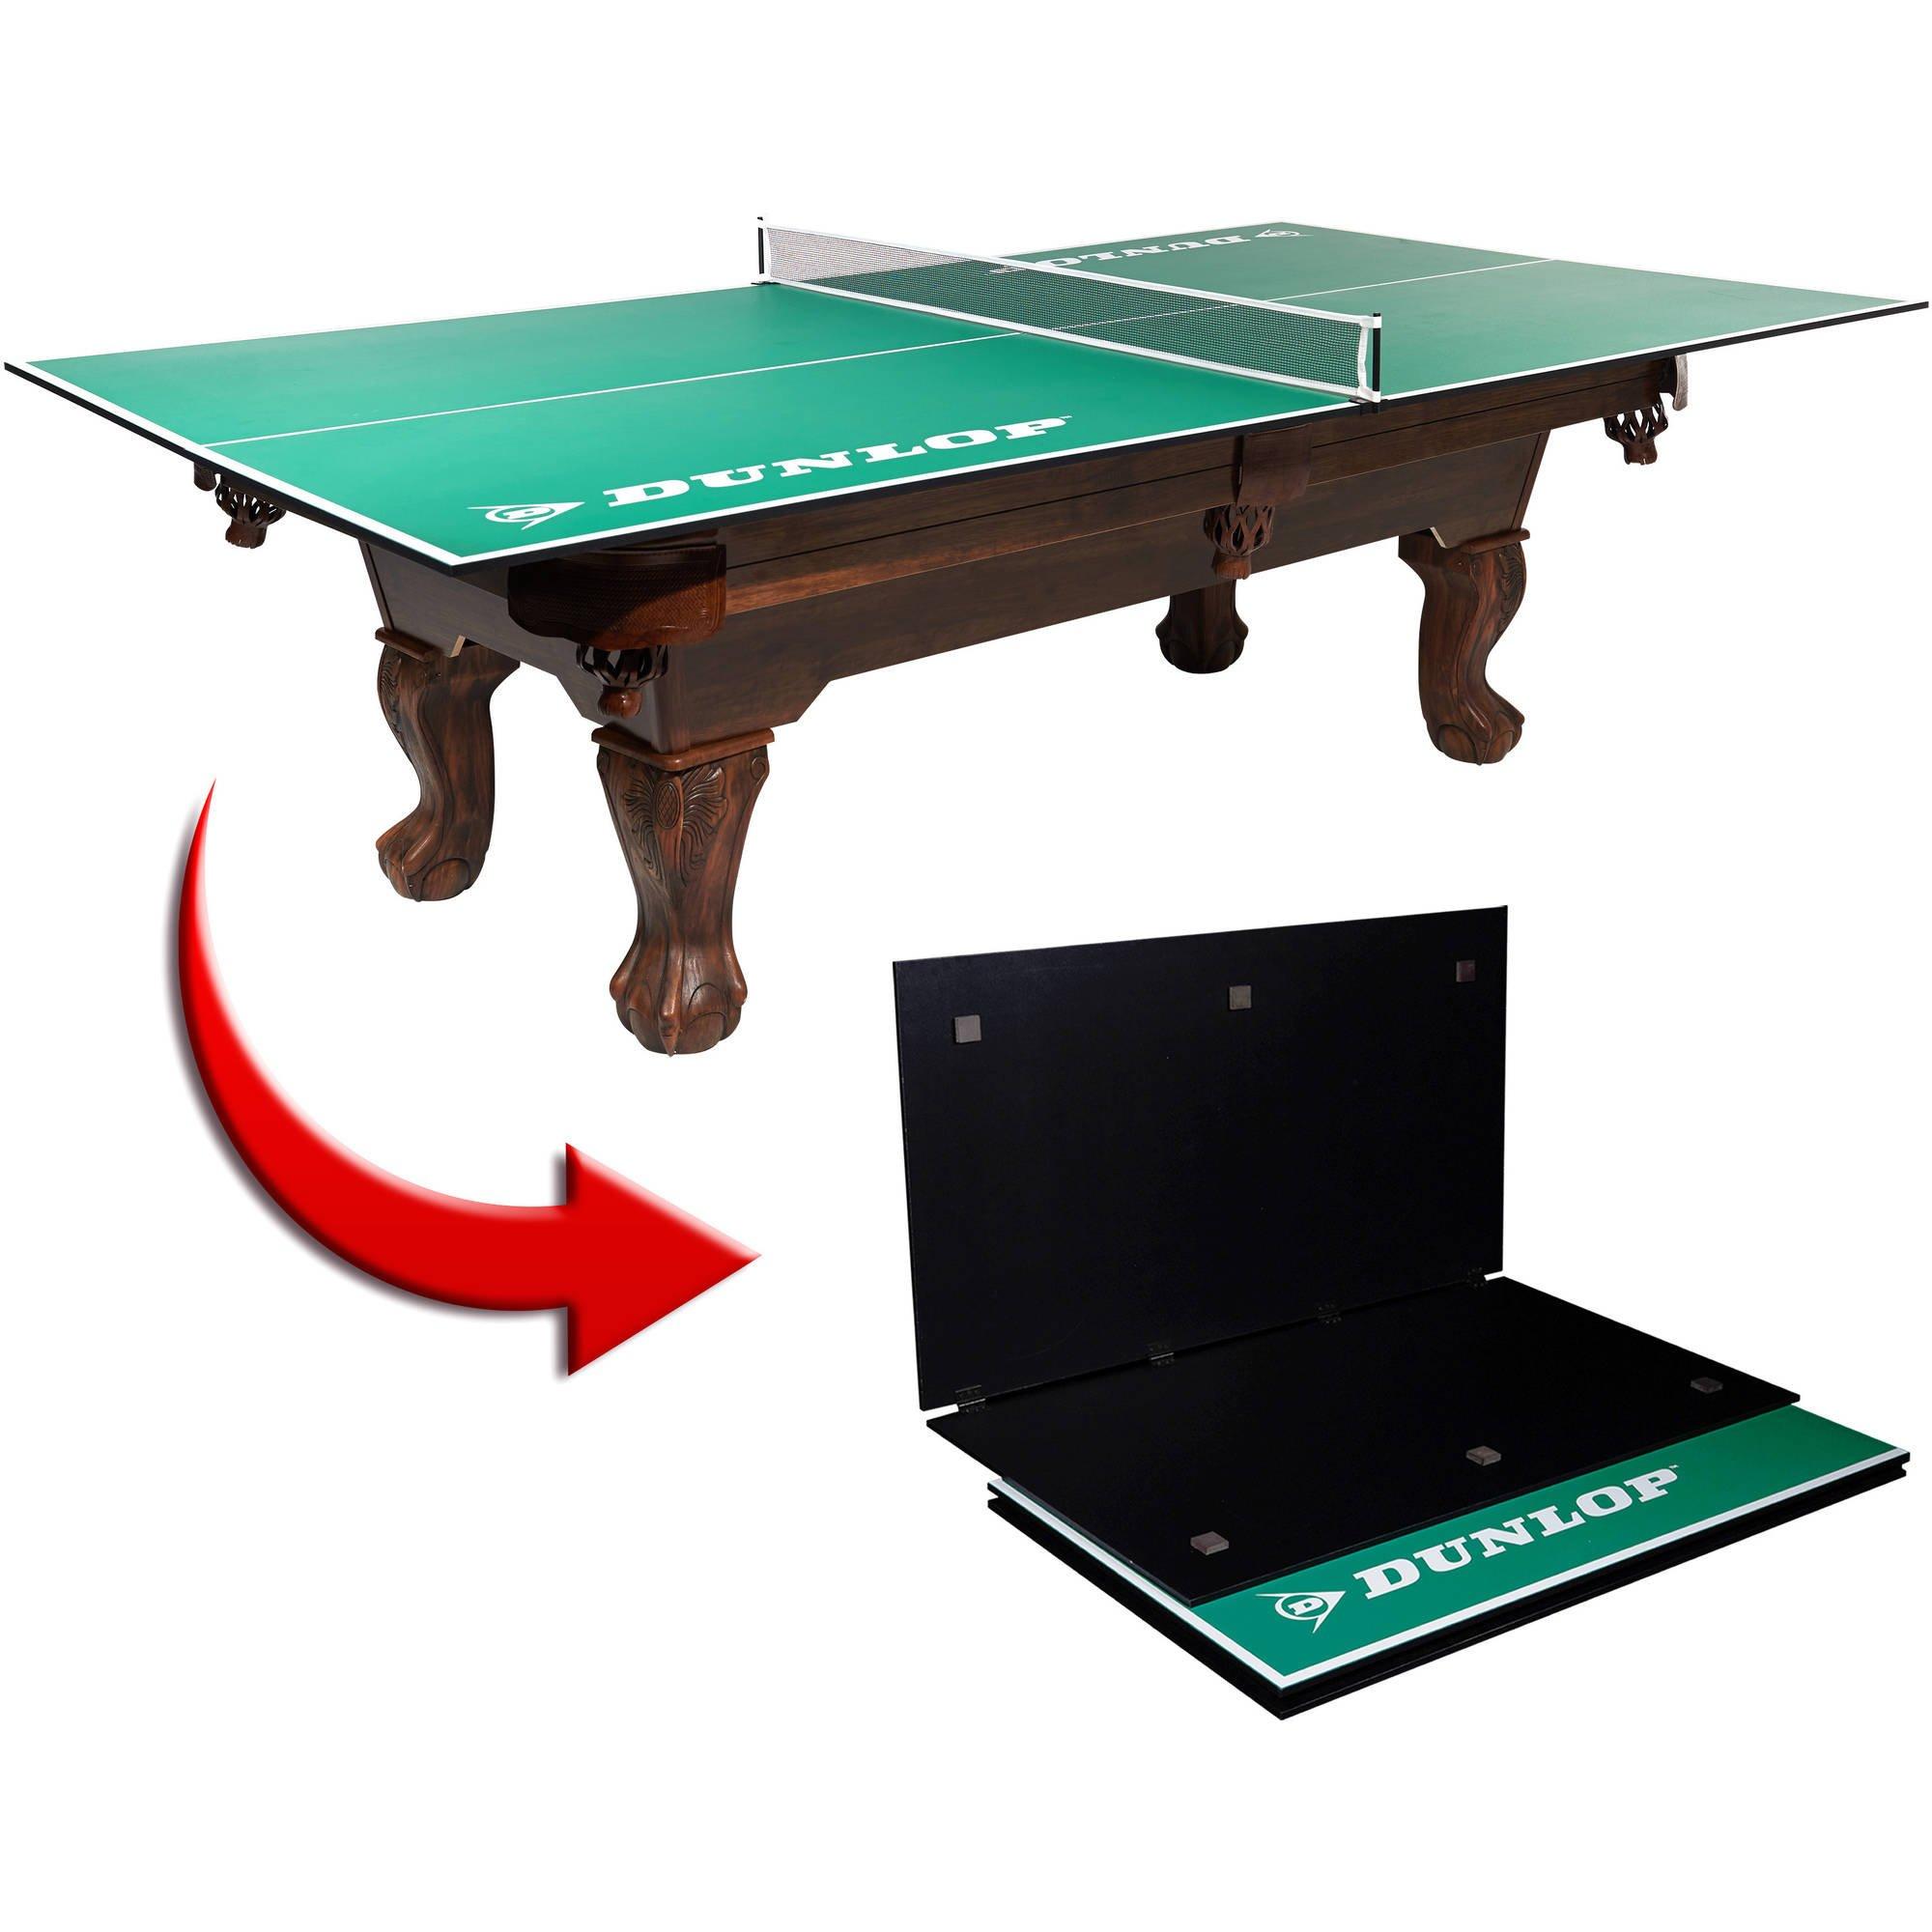 DUNLOP 4 PIECE TABLE TENNIS CONVERSION TOP